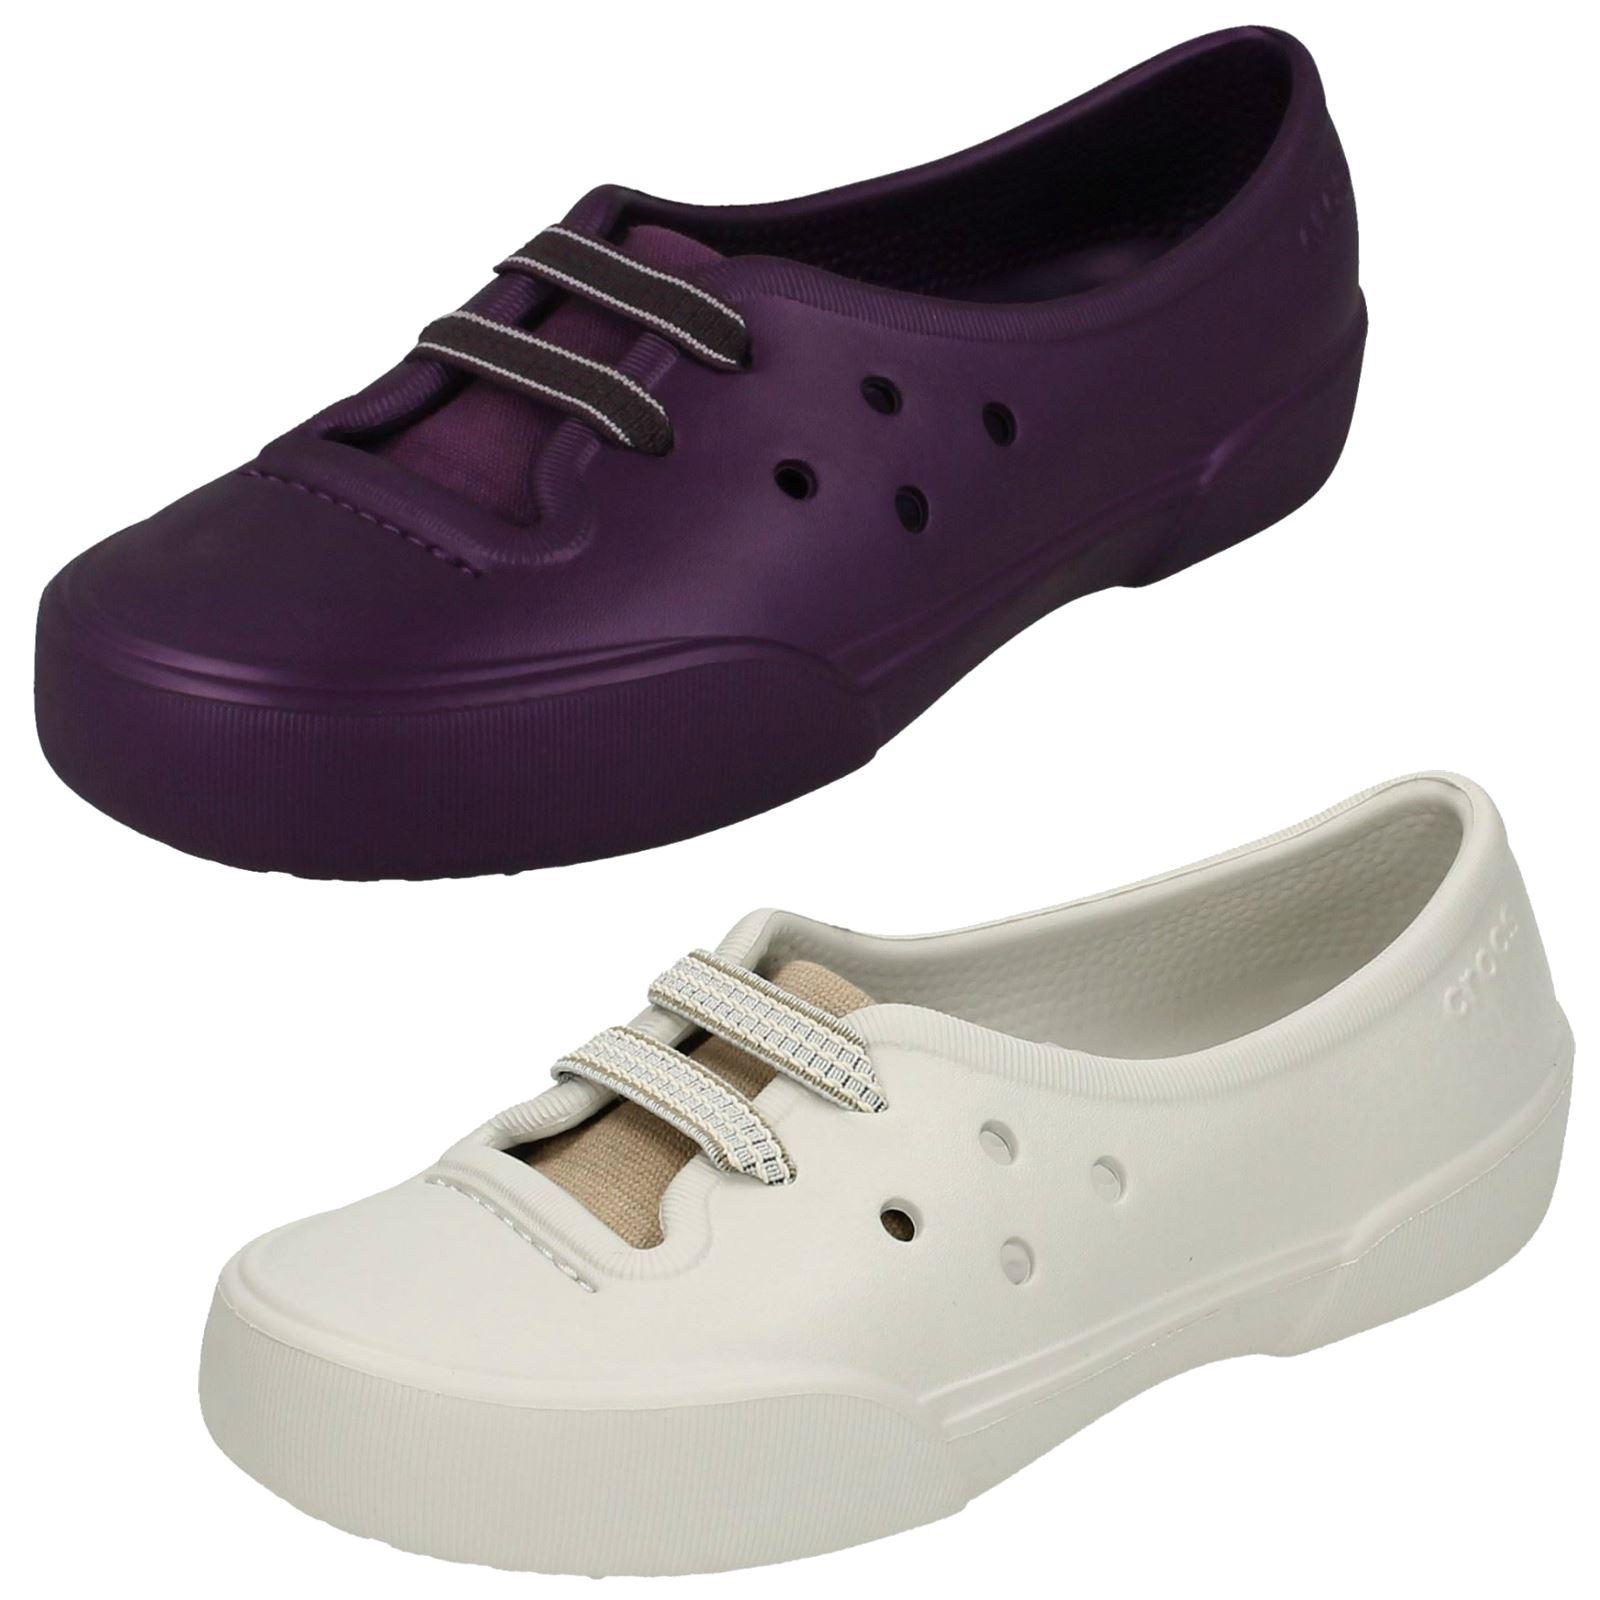 Nahanijunior Crocs Girls Slip On Flats